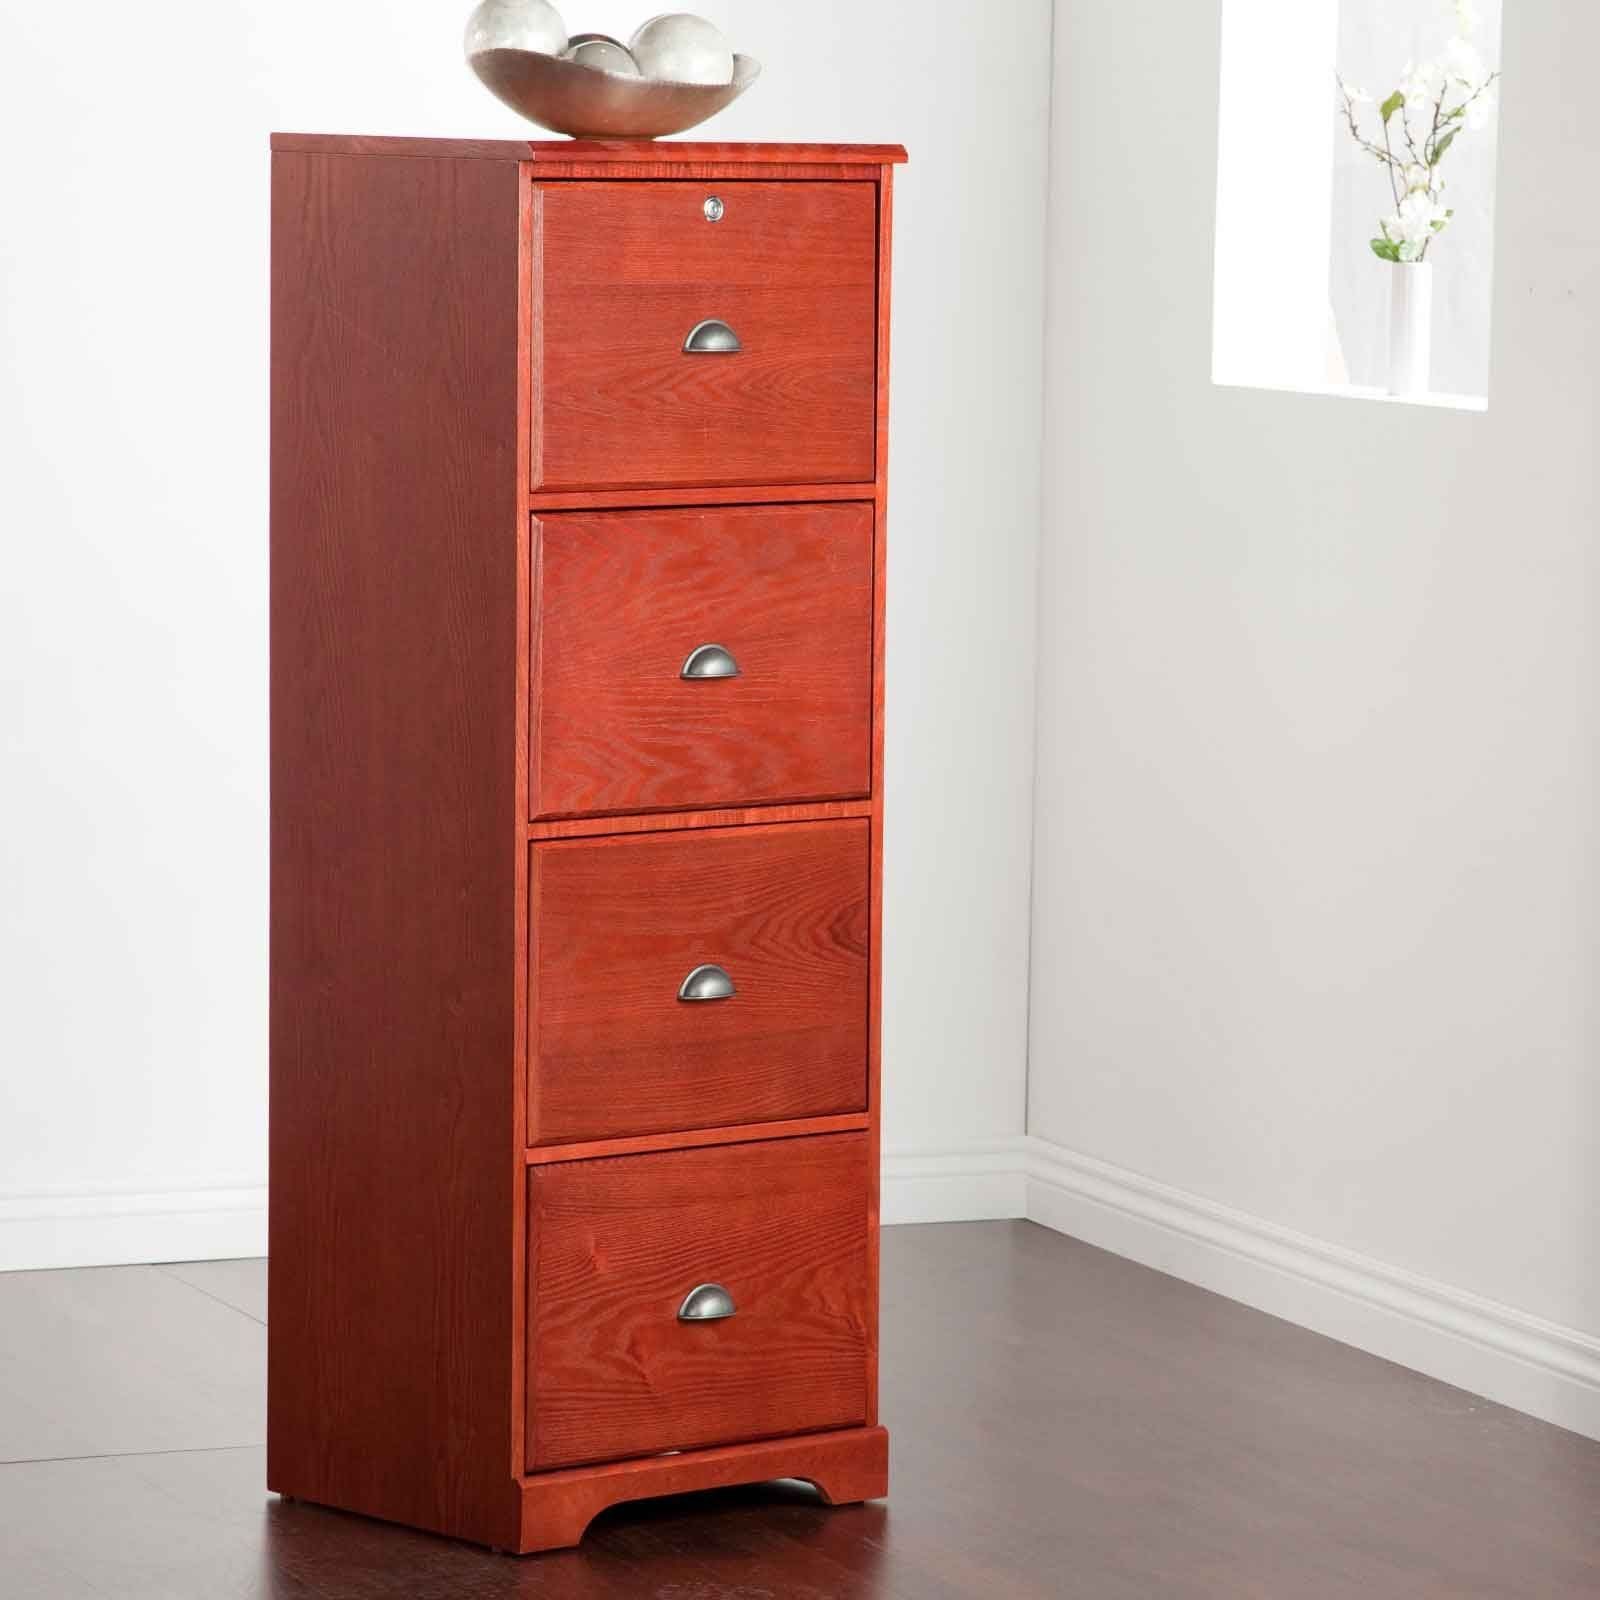 Vertical Wood File Cabinets 4 Drawer Filing Cabinet Liquor Cabinet Furniture Office Furniture File Cabinets